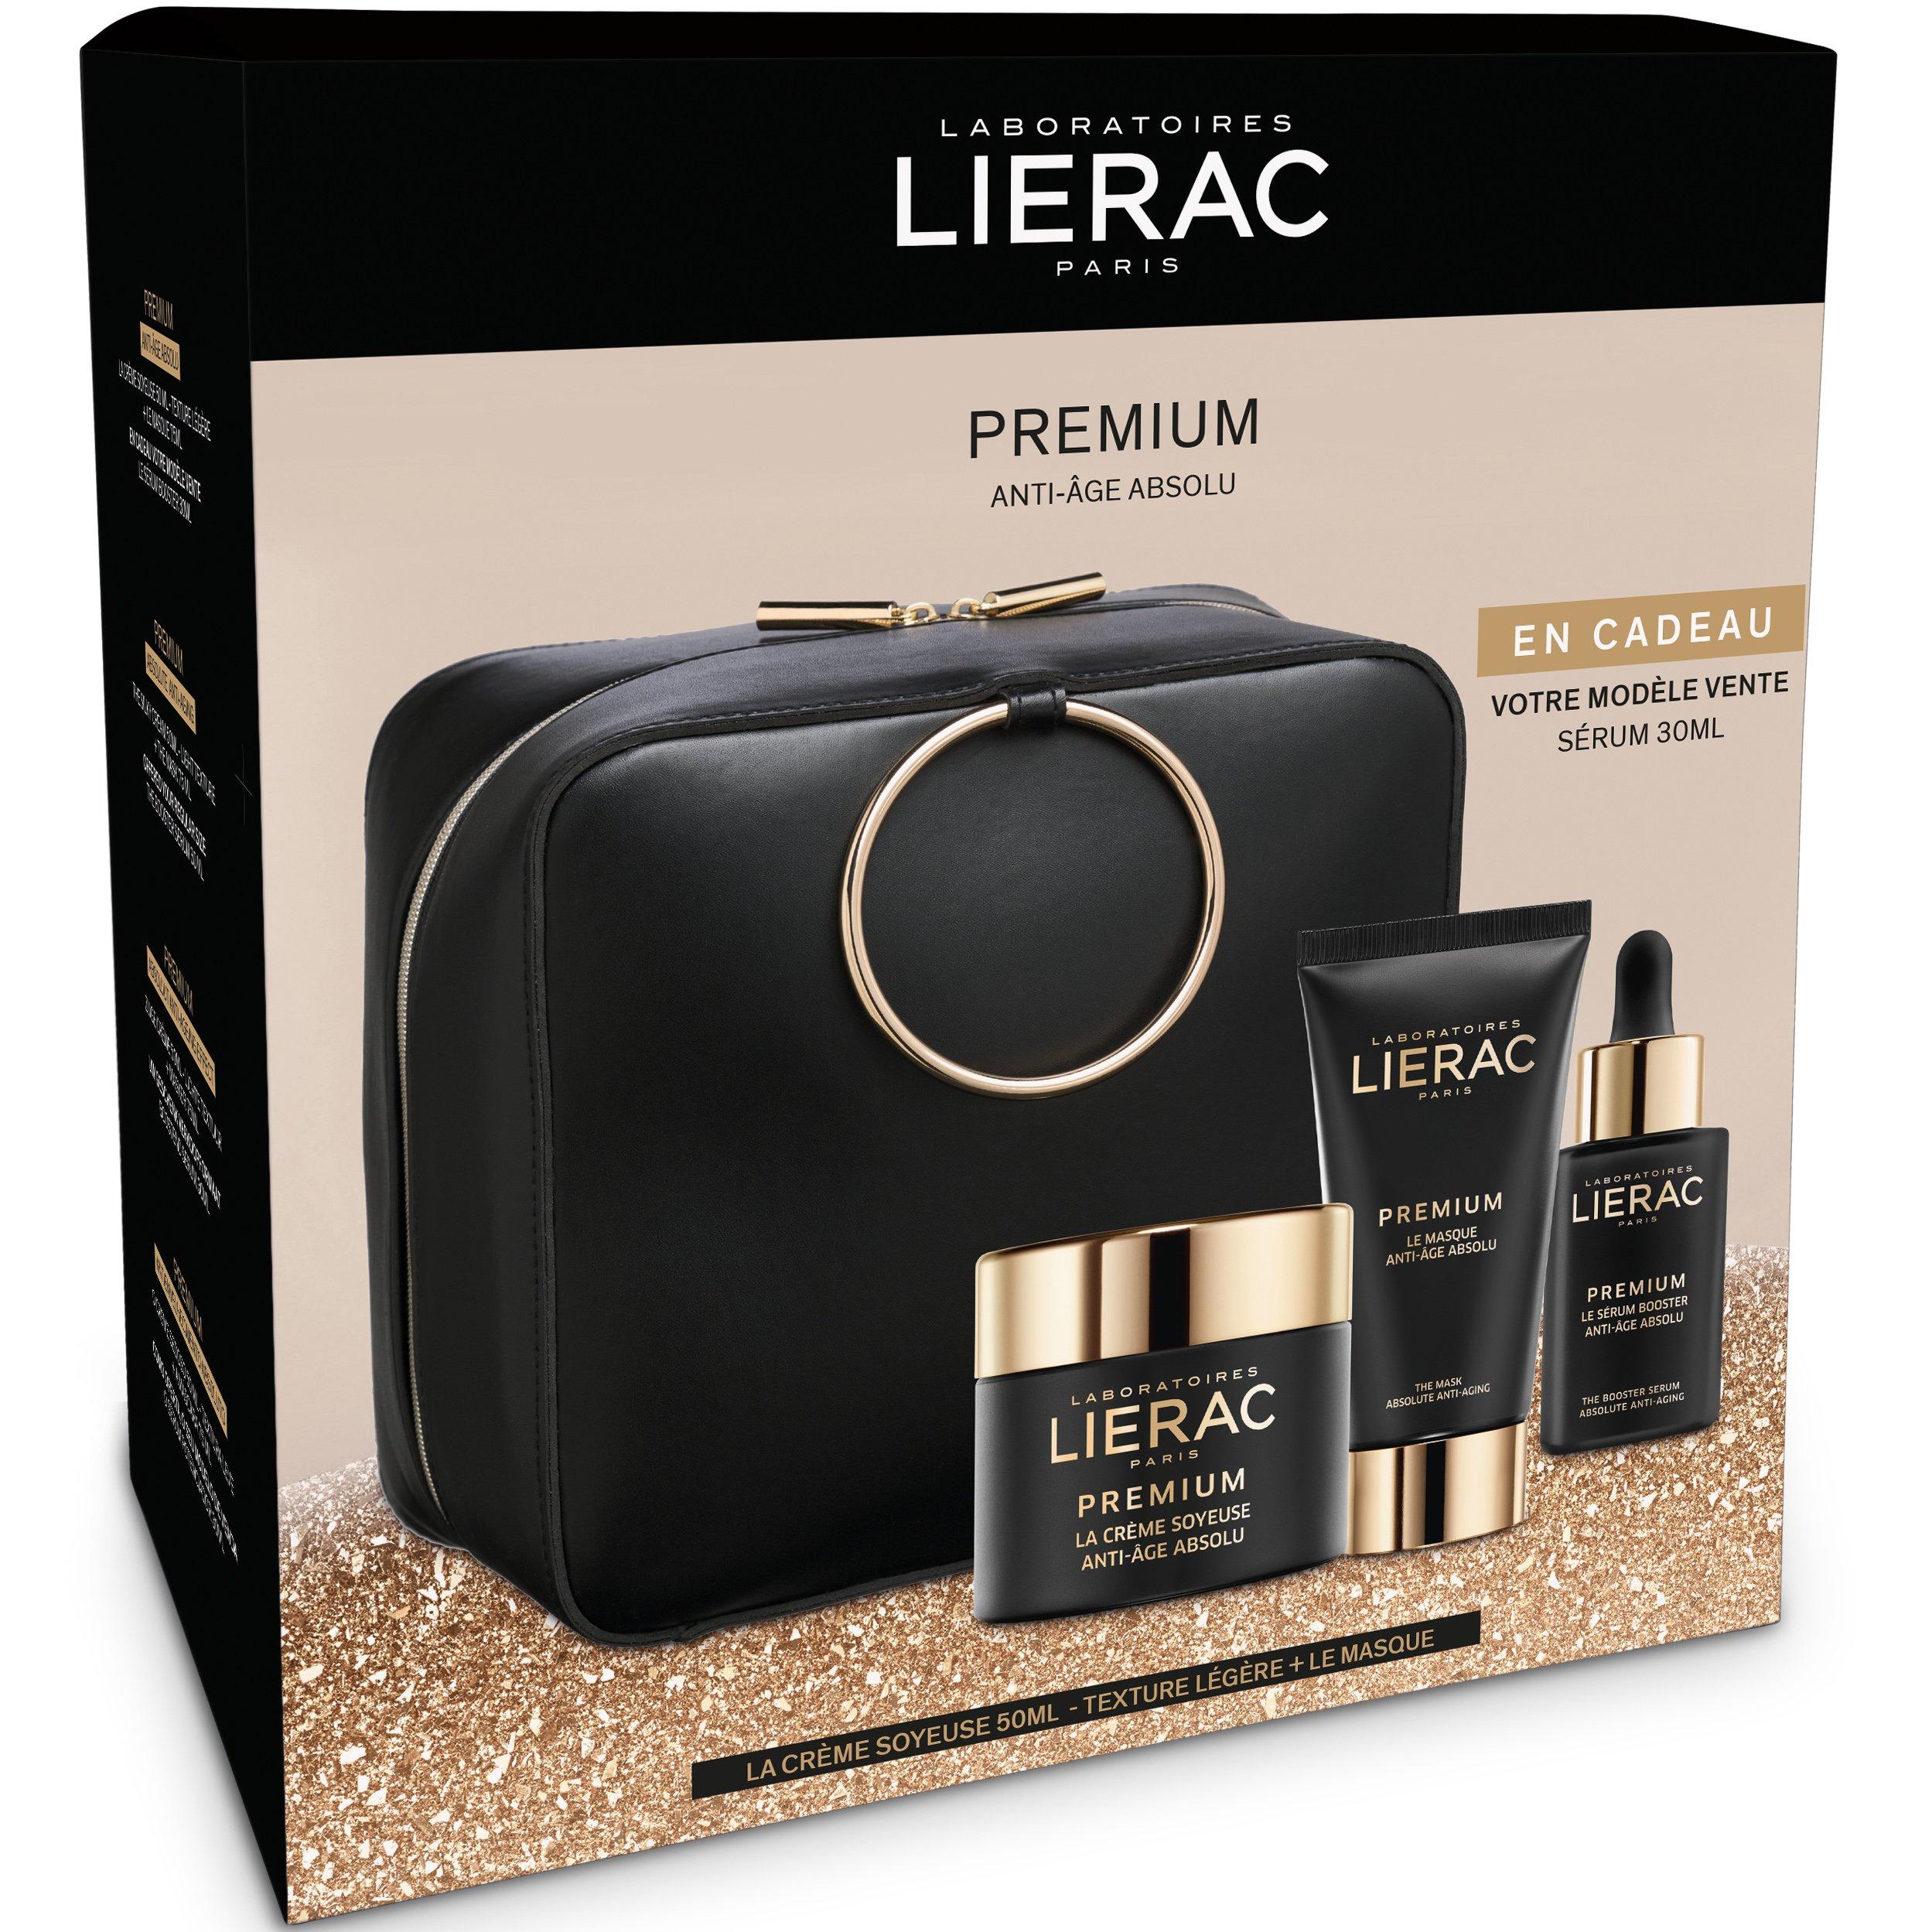 Lierac Gift Box Premium La Creme Soyeuse Legere 50ml, Premium La Masque 75ml & Δ προσφορές   σετ περιποίησης προσώπου   σετ αντιγήρανσης και σύσφιξης